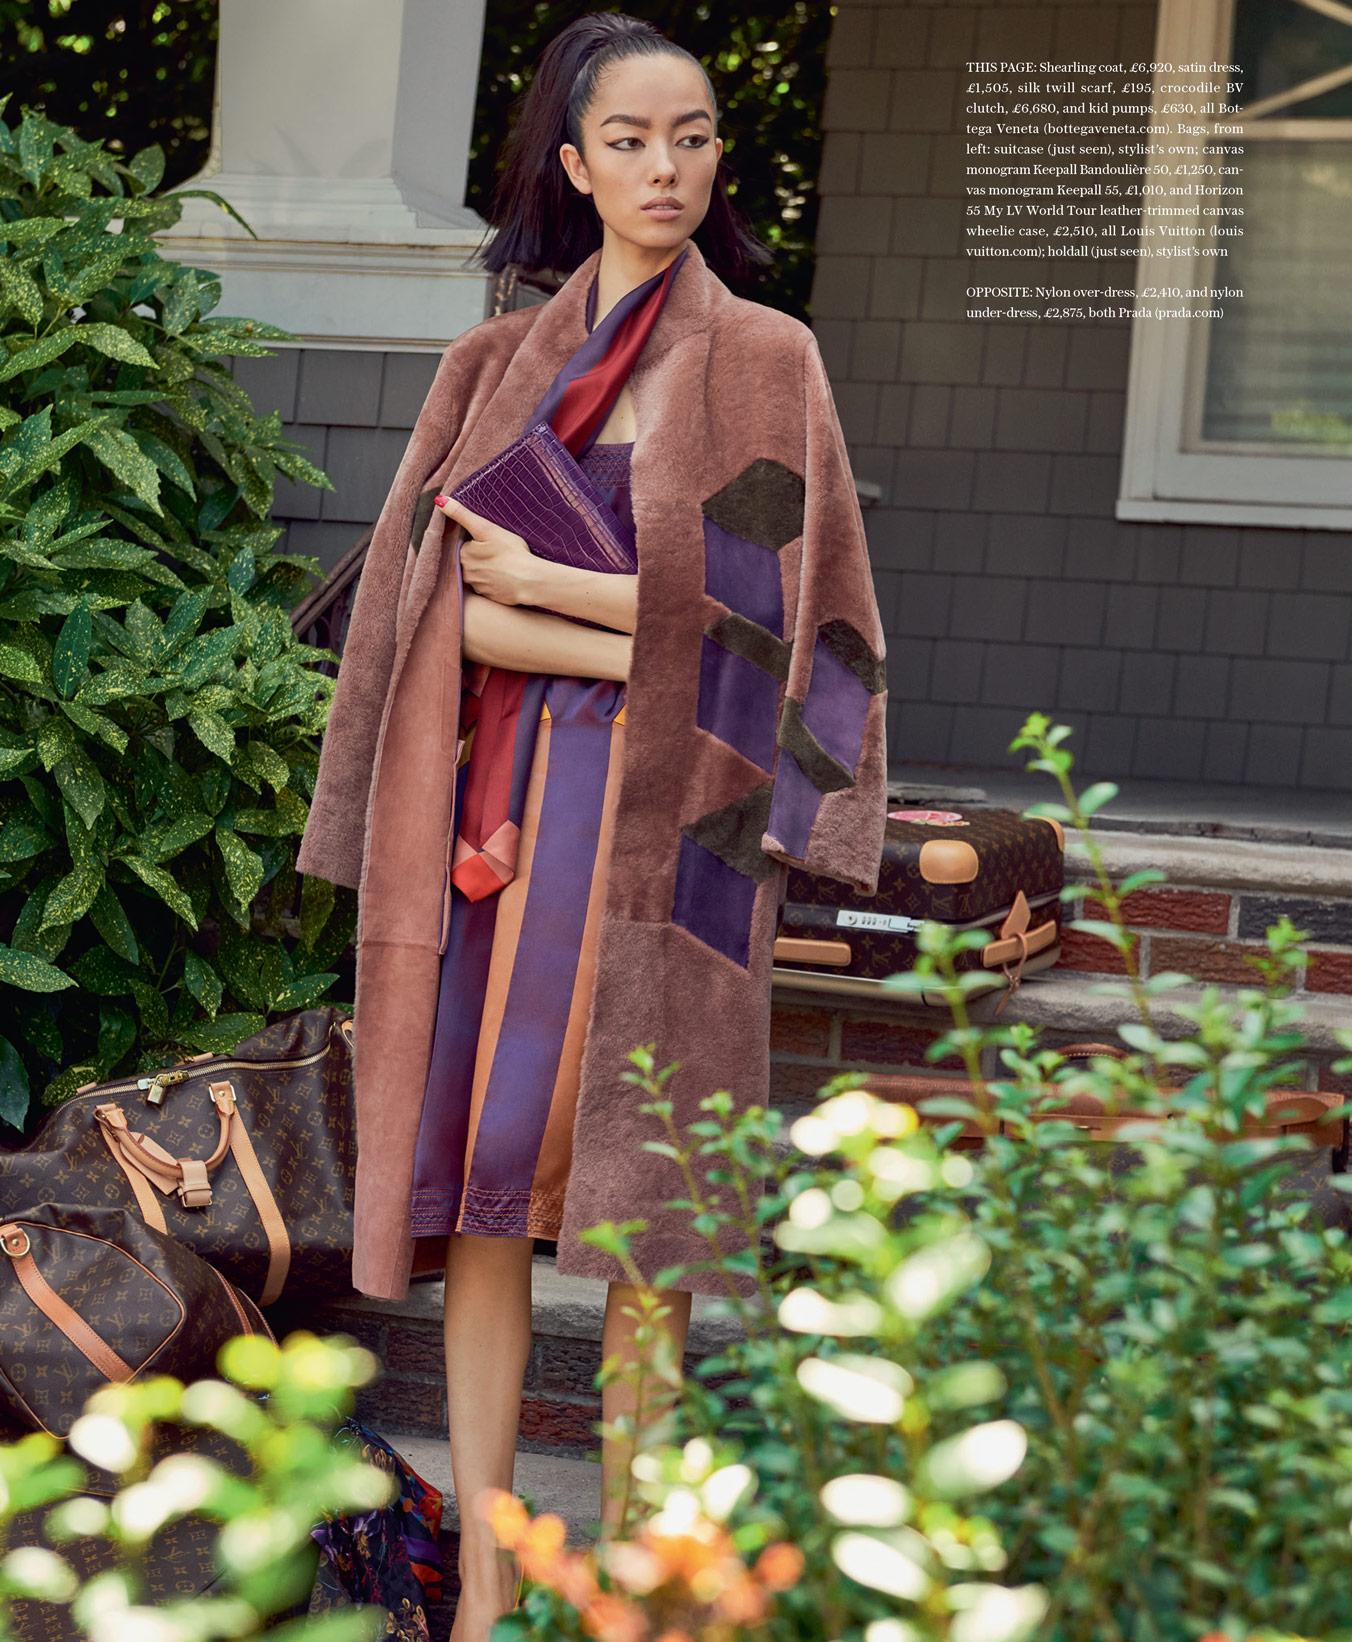 15-Sep-Lux-Fashion_PamelaHanson_Reduced-2-1.jpg